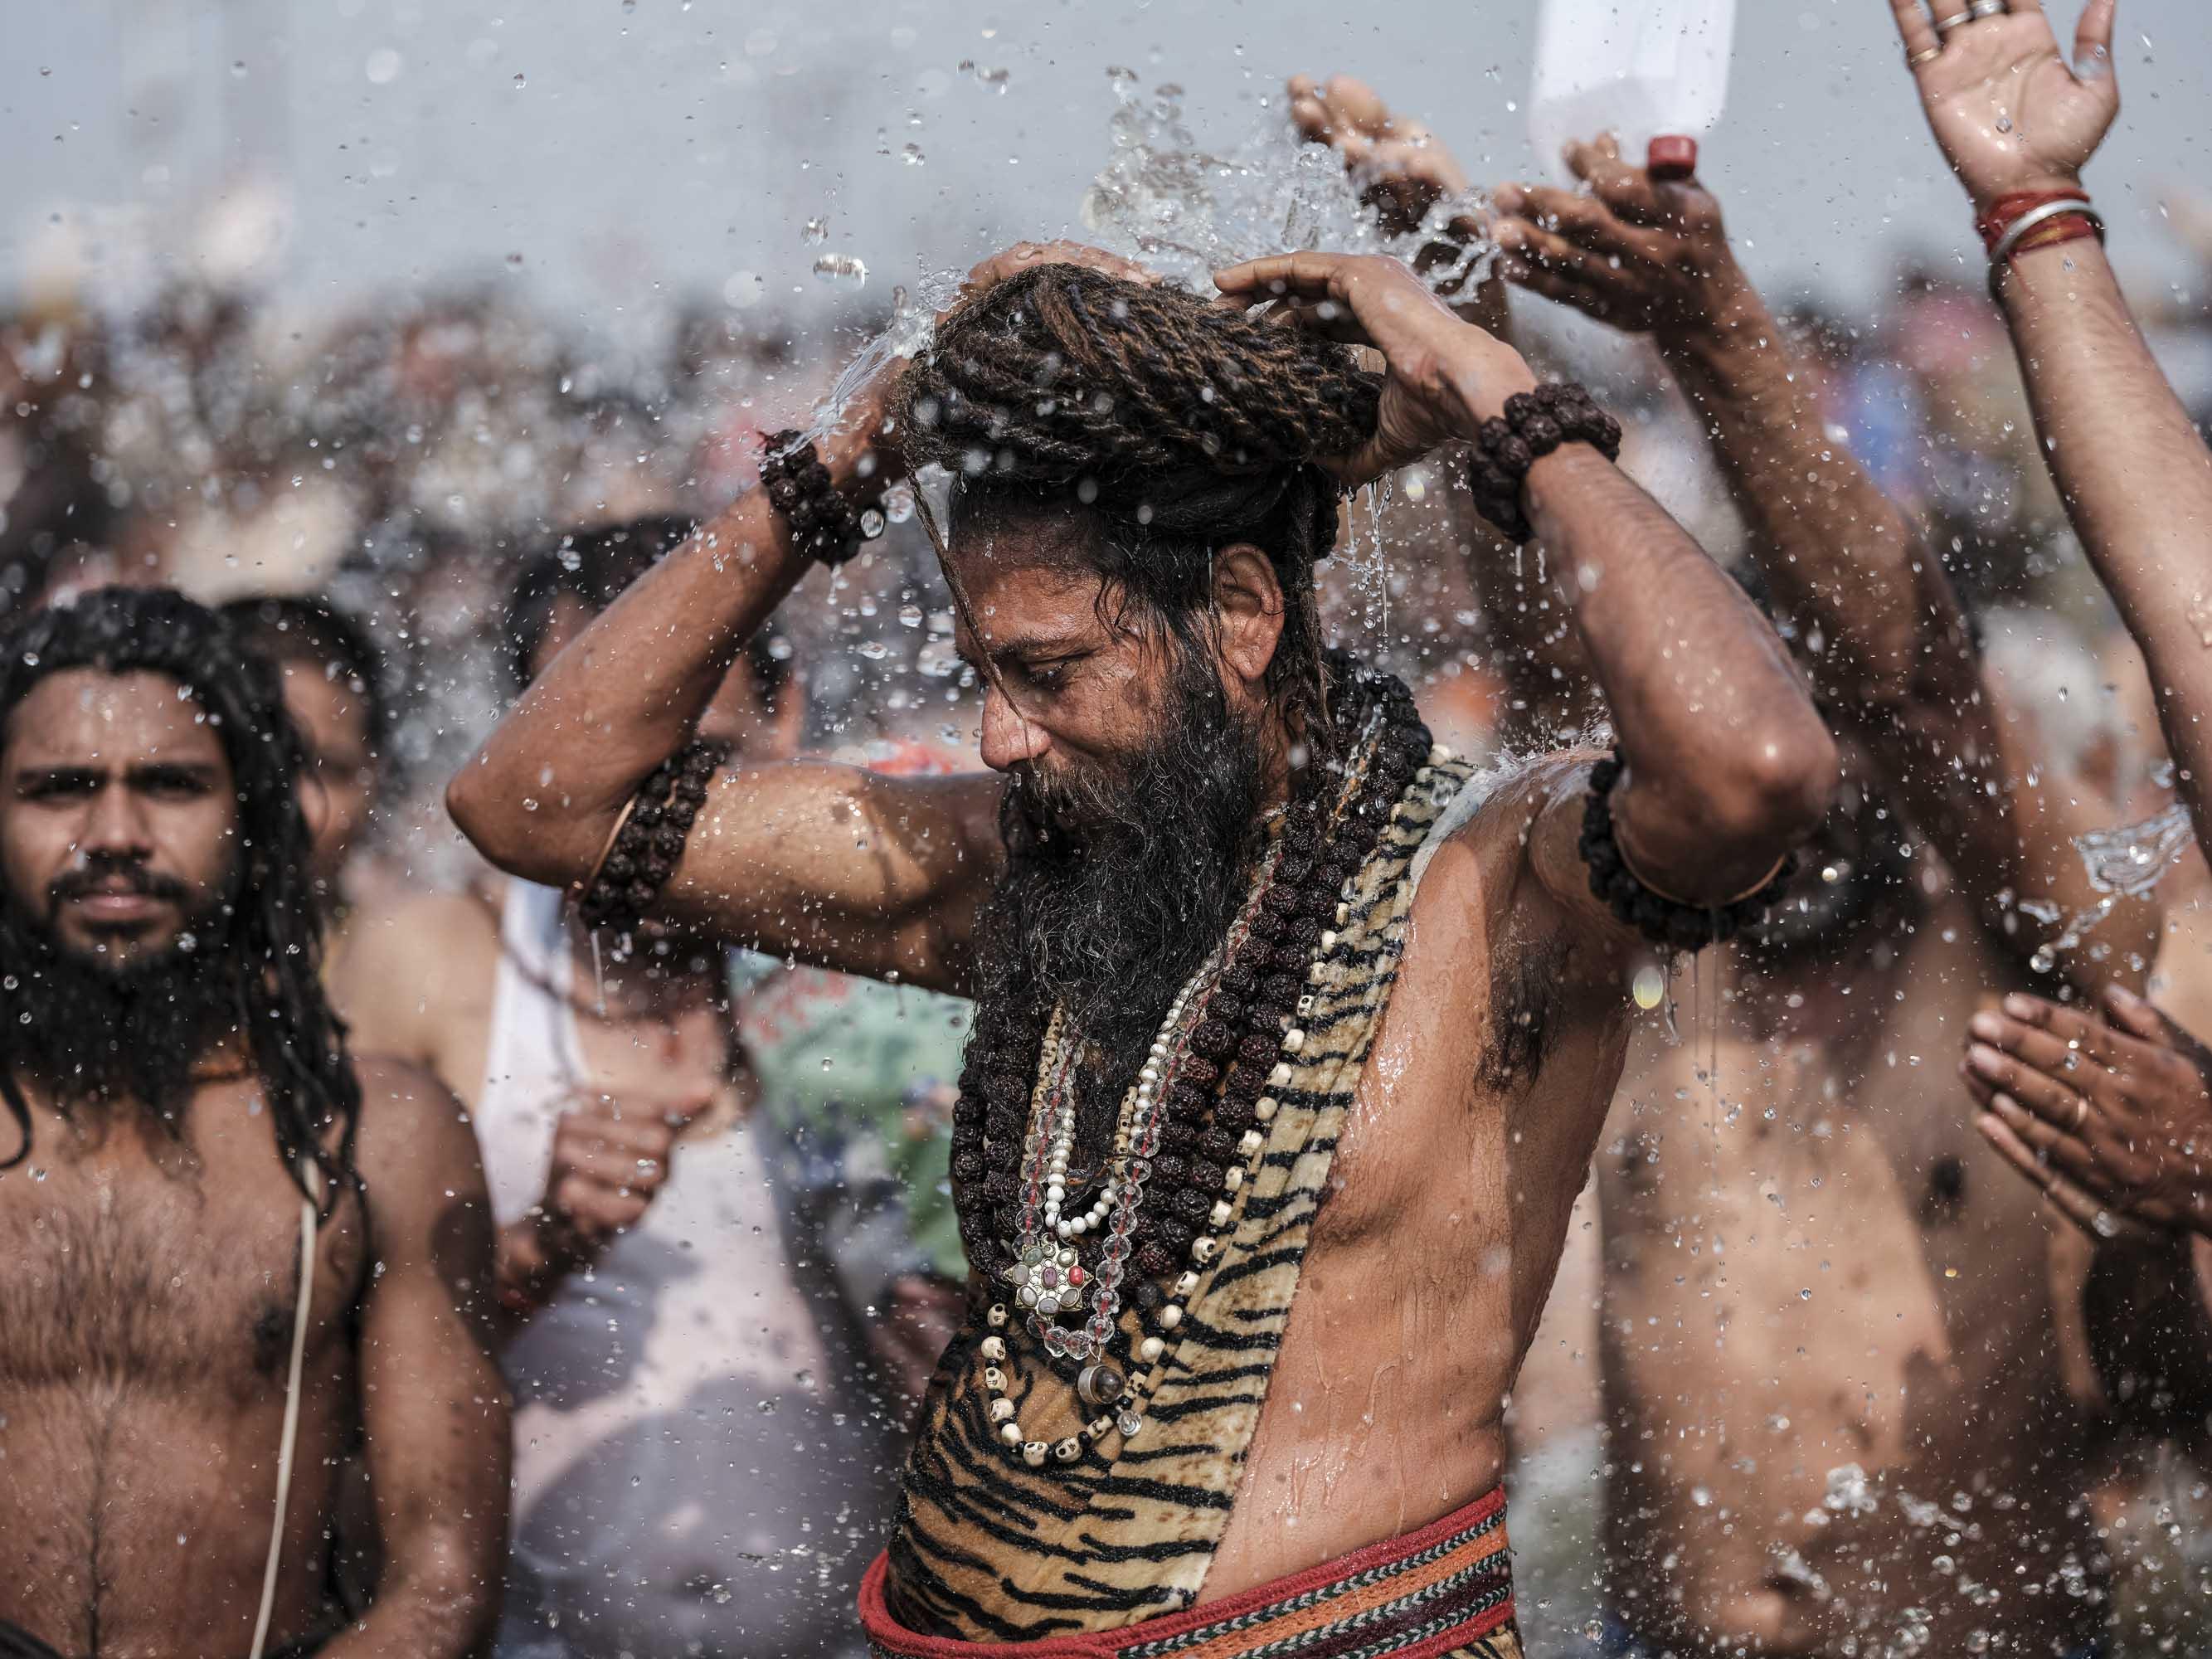 baba bath crowd 4 February pilgrims Kumbh mela 2019 India Allahabad Prayagraj Ardh hindu religious Festival event rivers photographer jose jeuland photography